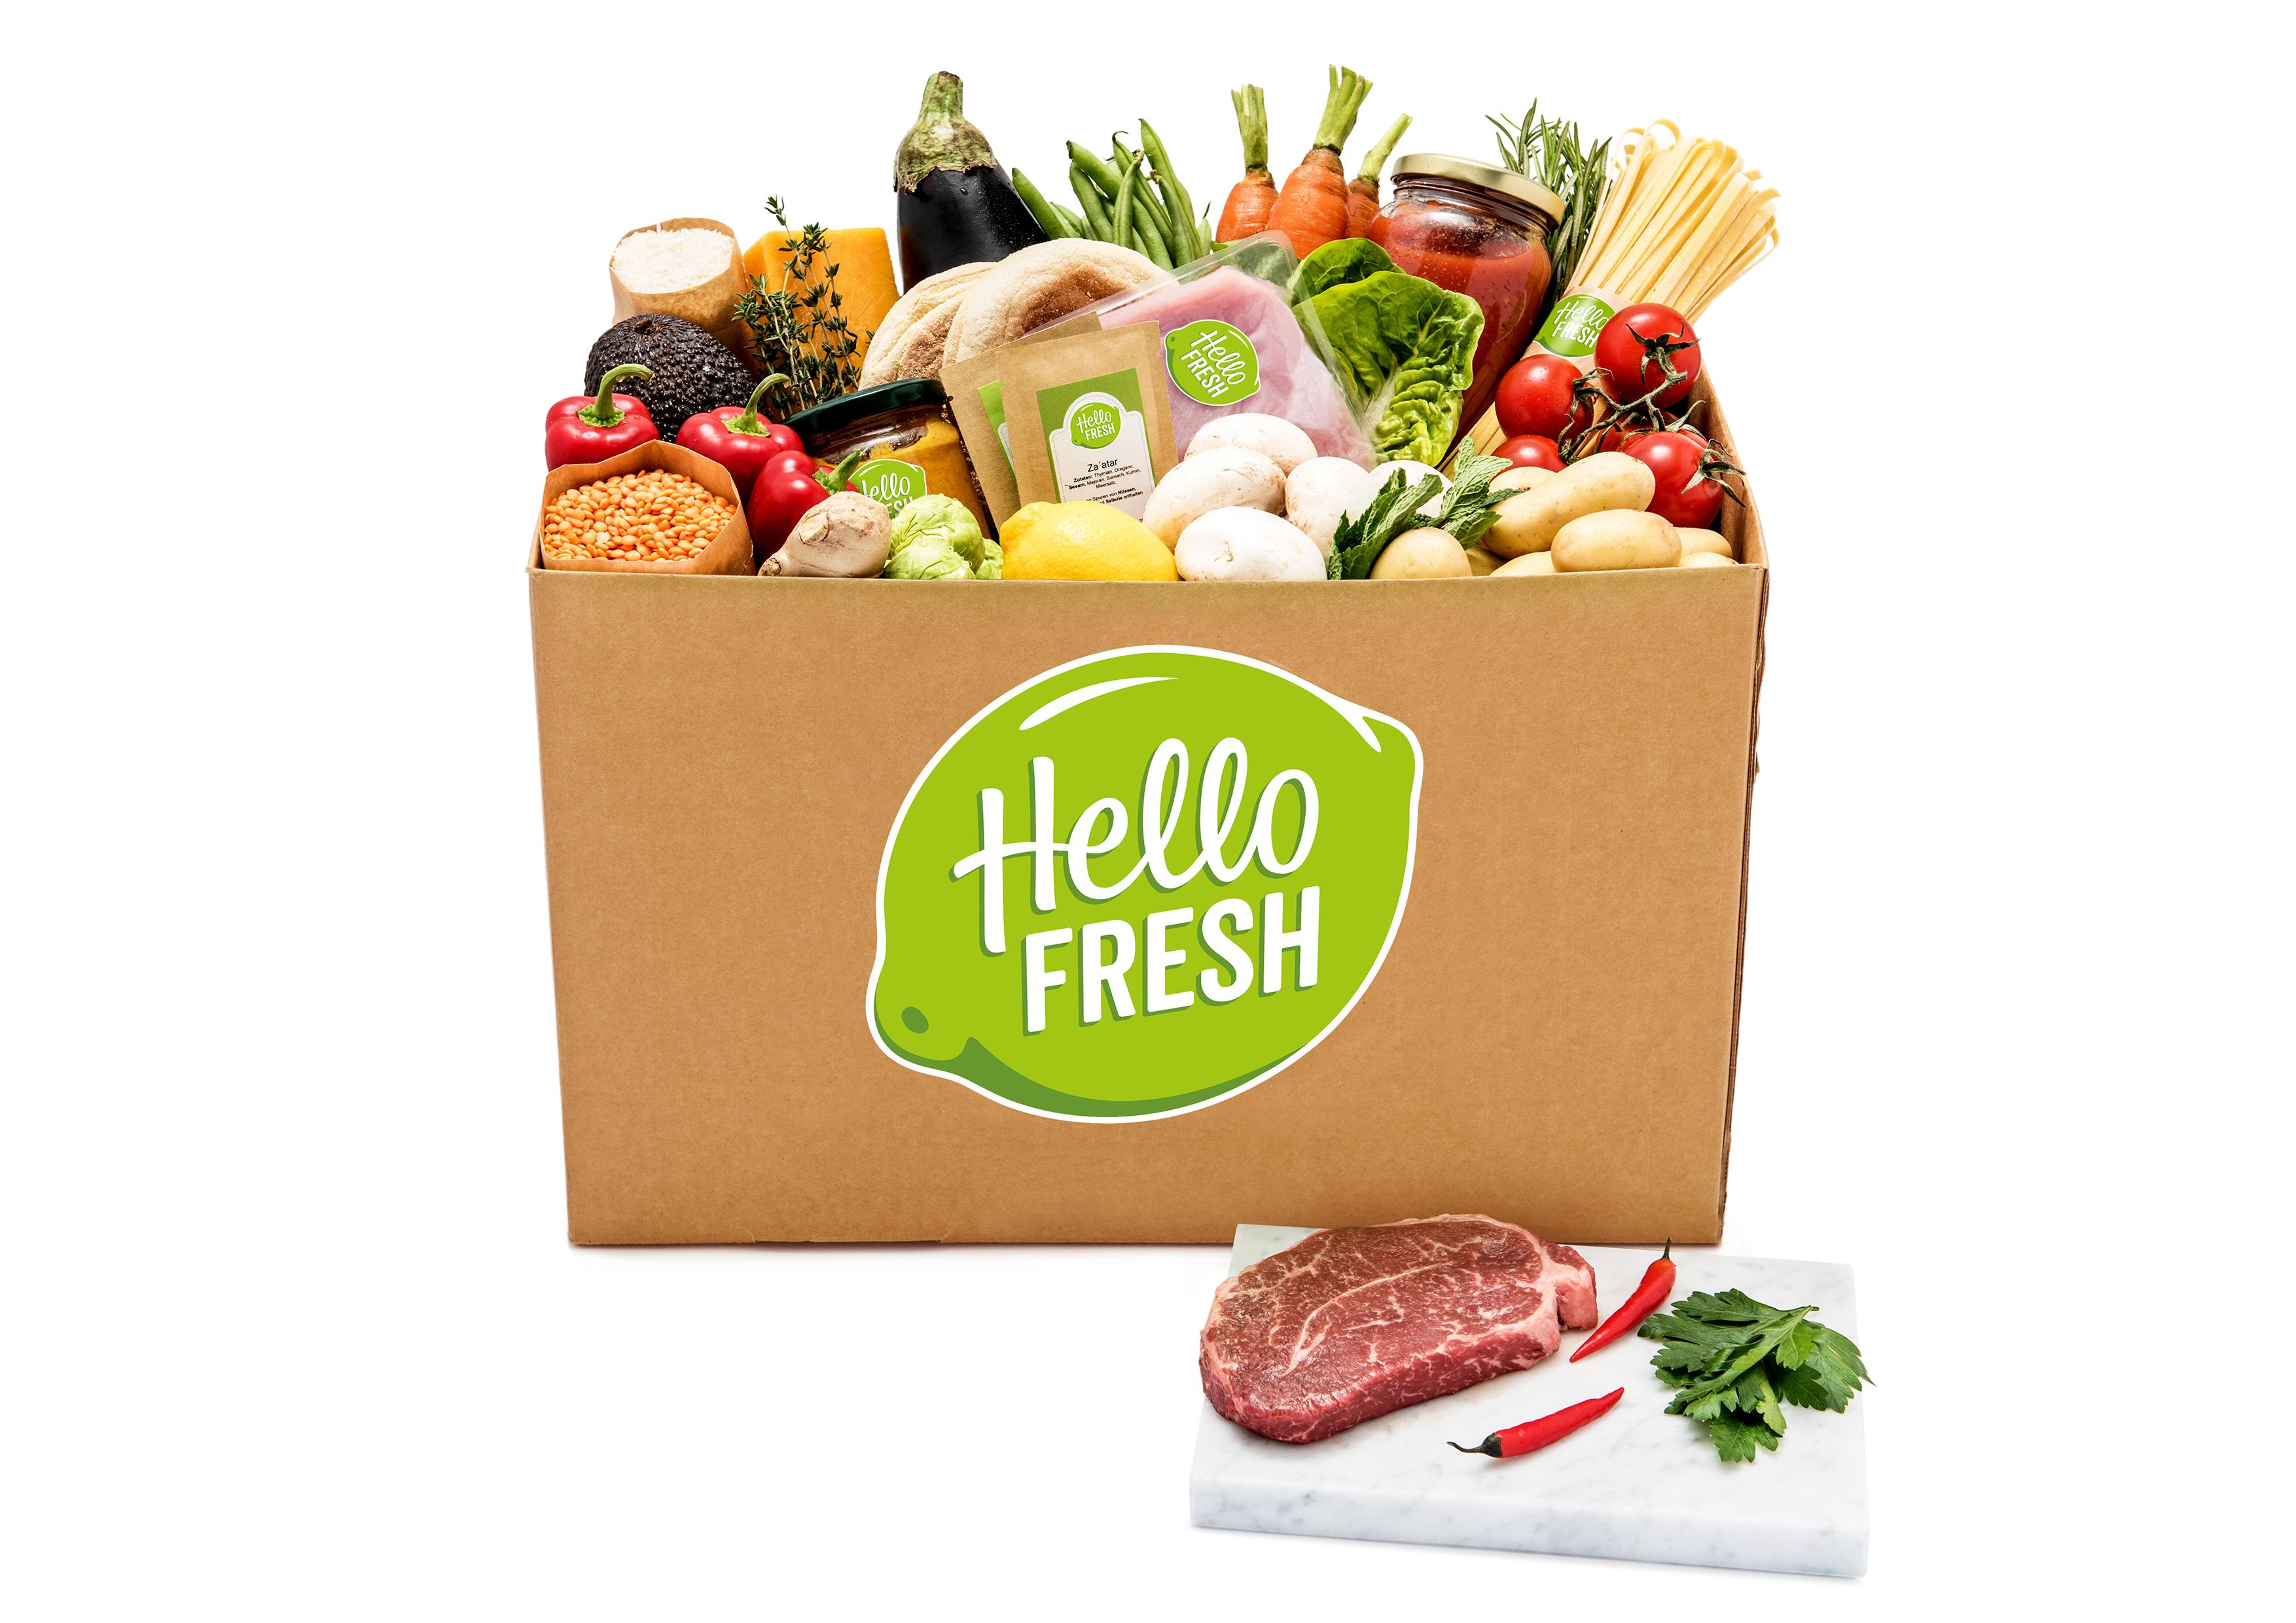 Hello Fresh Box Kosten